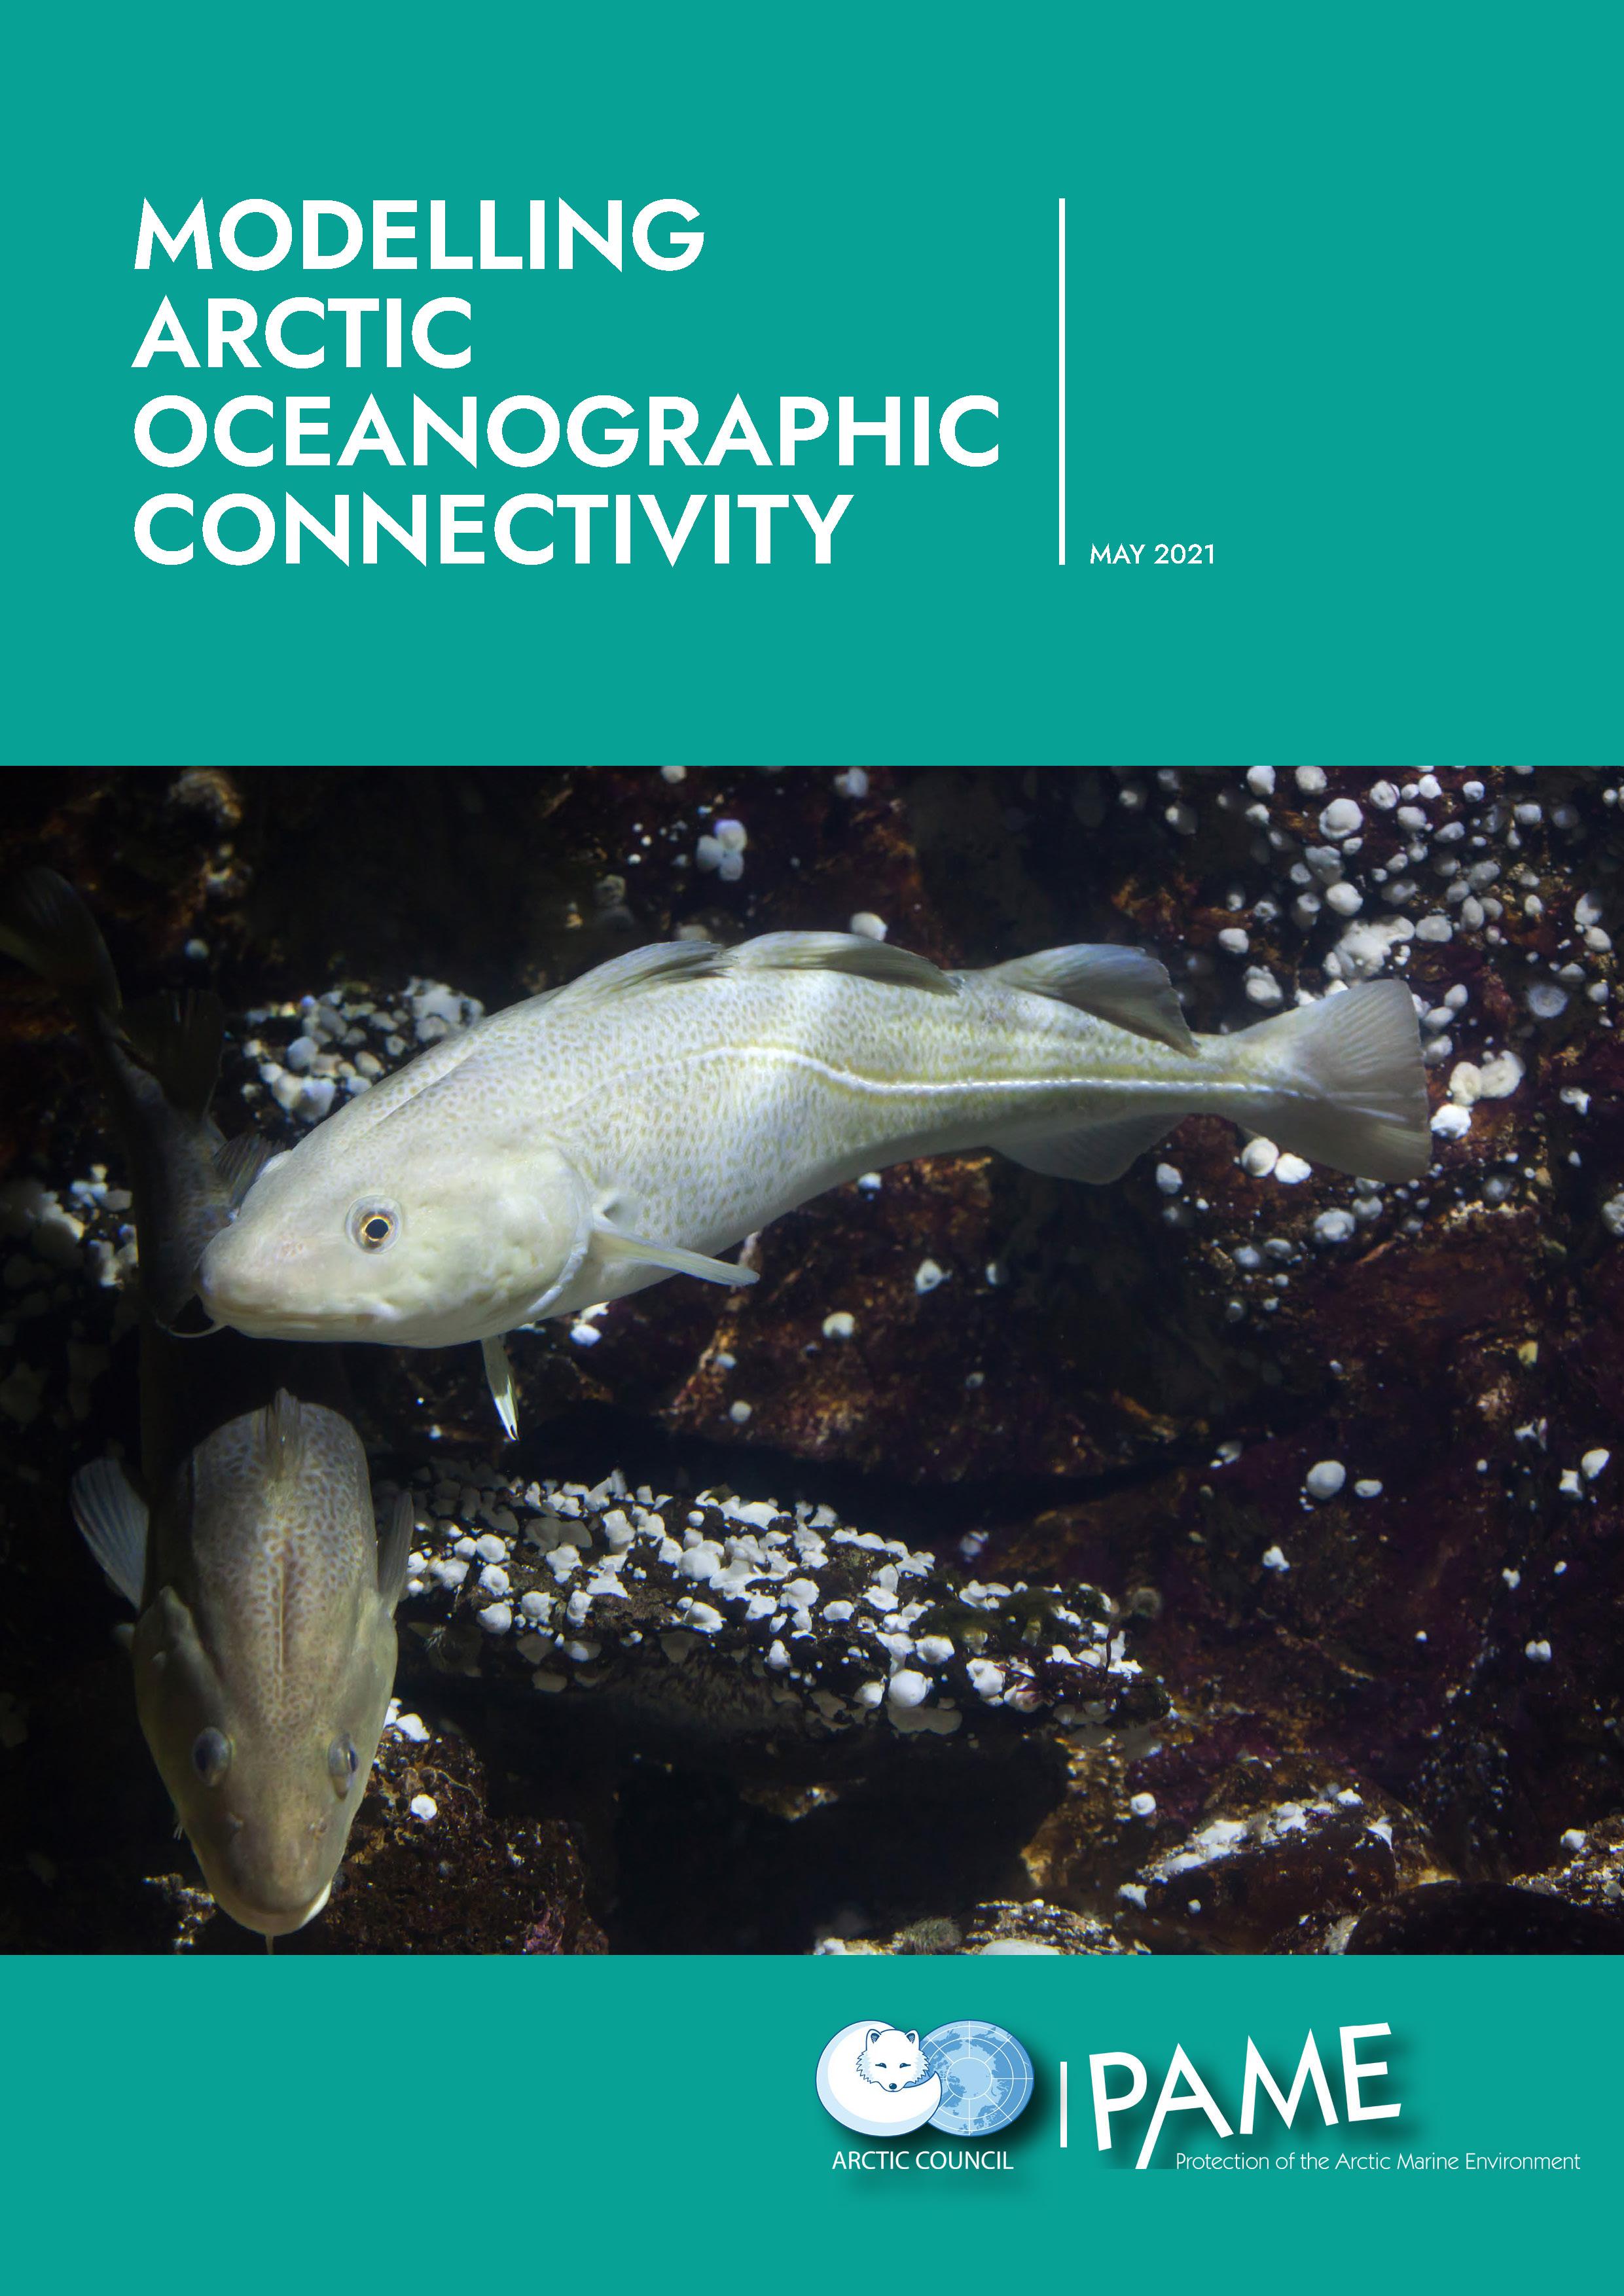 Modelling Arctic Oceanographic Connectivity